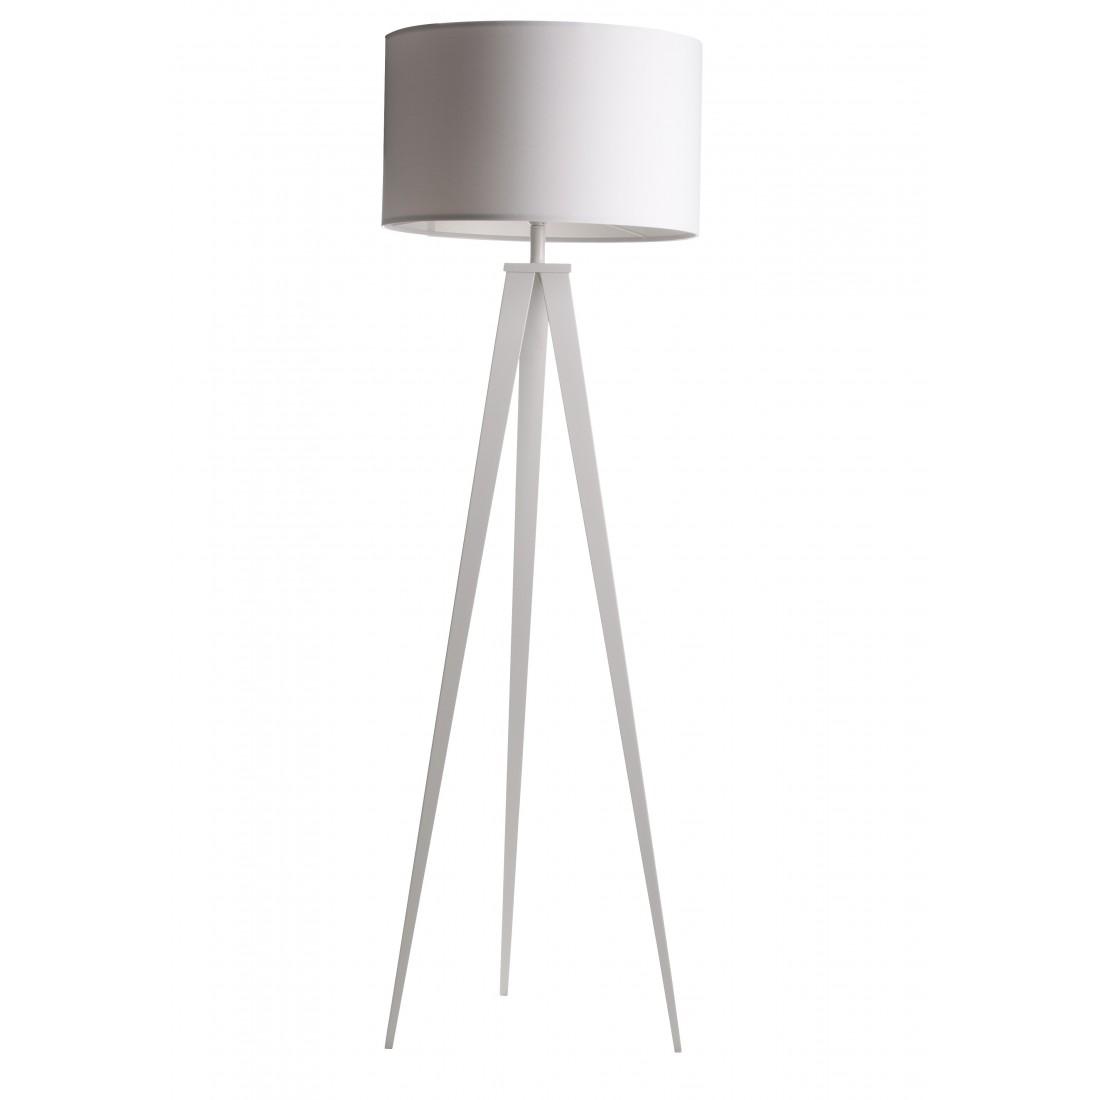 Lampadaire sur pied tripod m tal blanc design scandinave for Miroir tripod